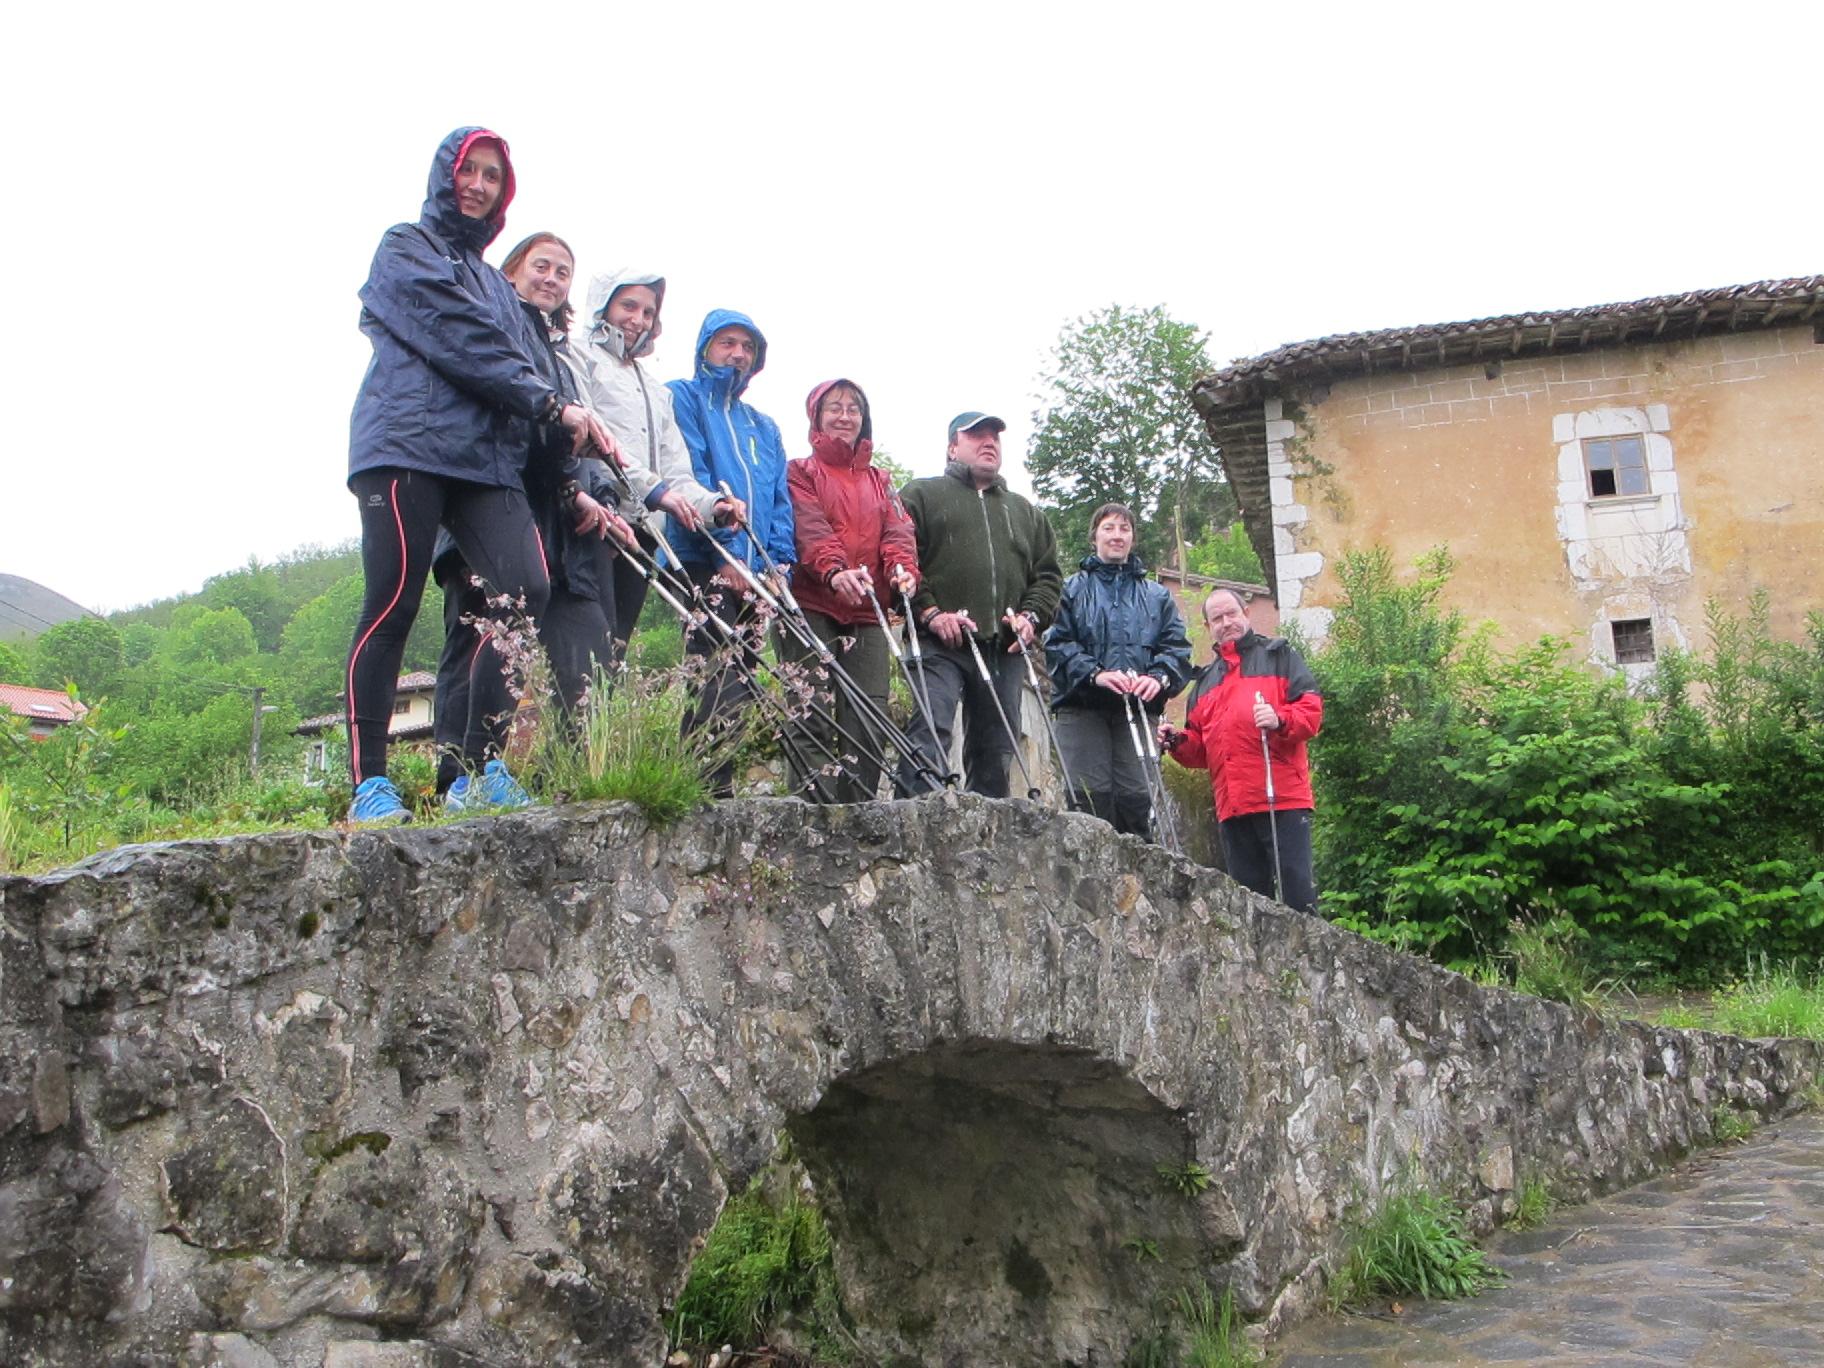 turismo-activo-asturias-senderismo-entorno-picos-europa